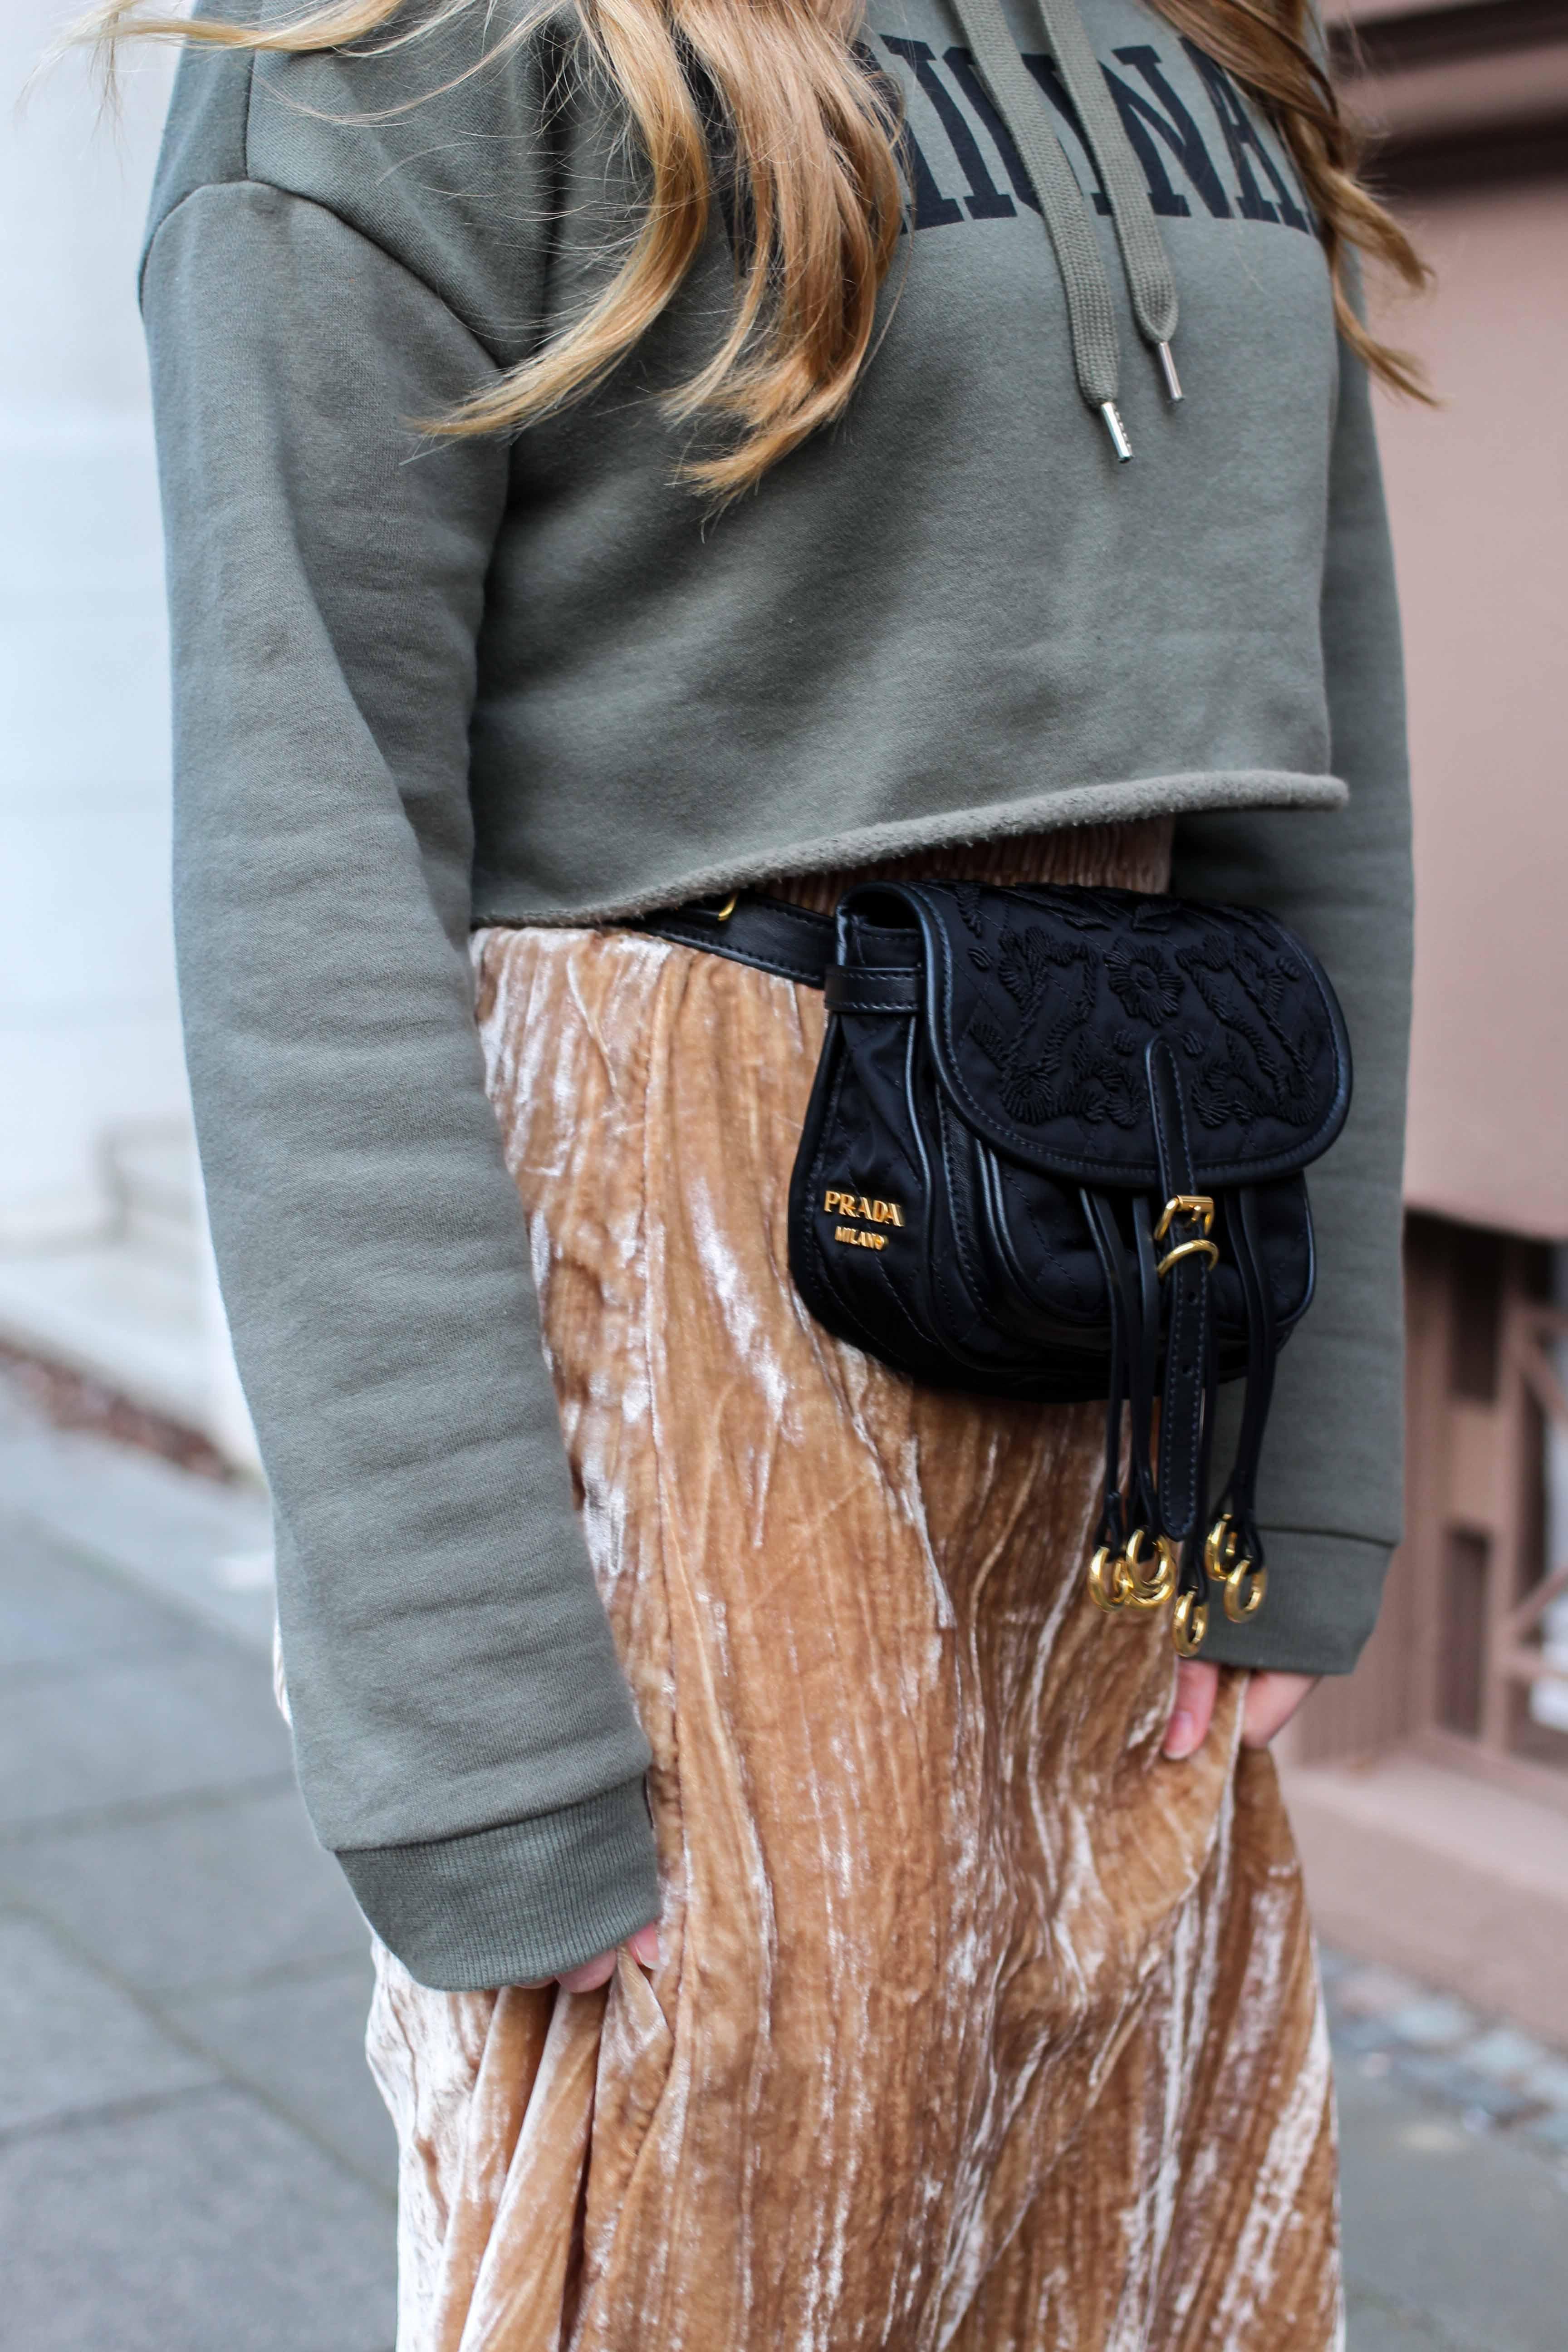 Trendtasche 2019 Gürteltasche kombiniern Gürteltasche Prada Streetstyle Outfit Bonn Frühling Look Crop Pullover 4